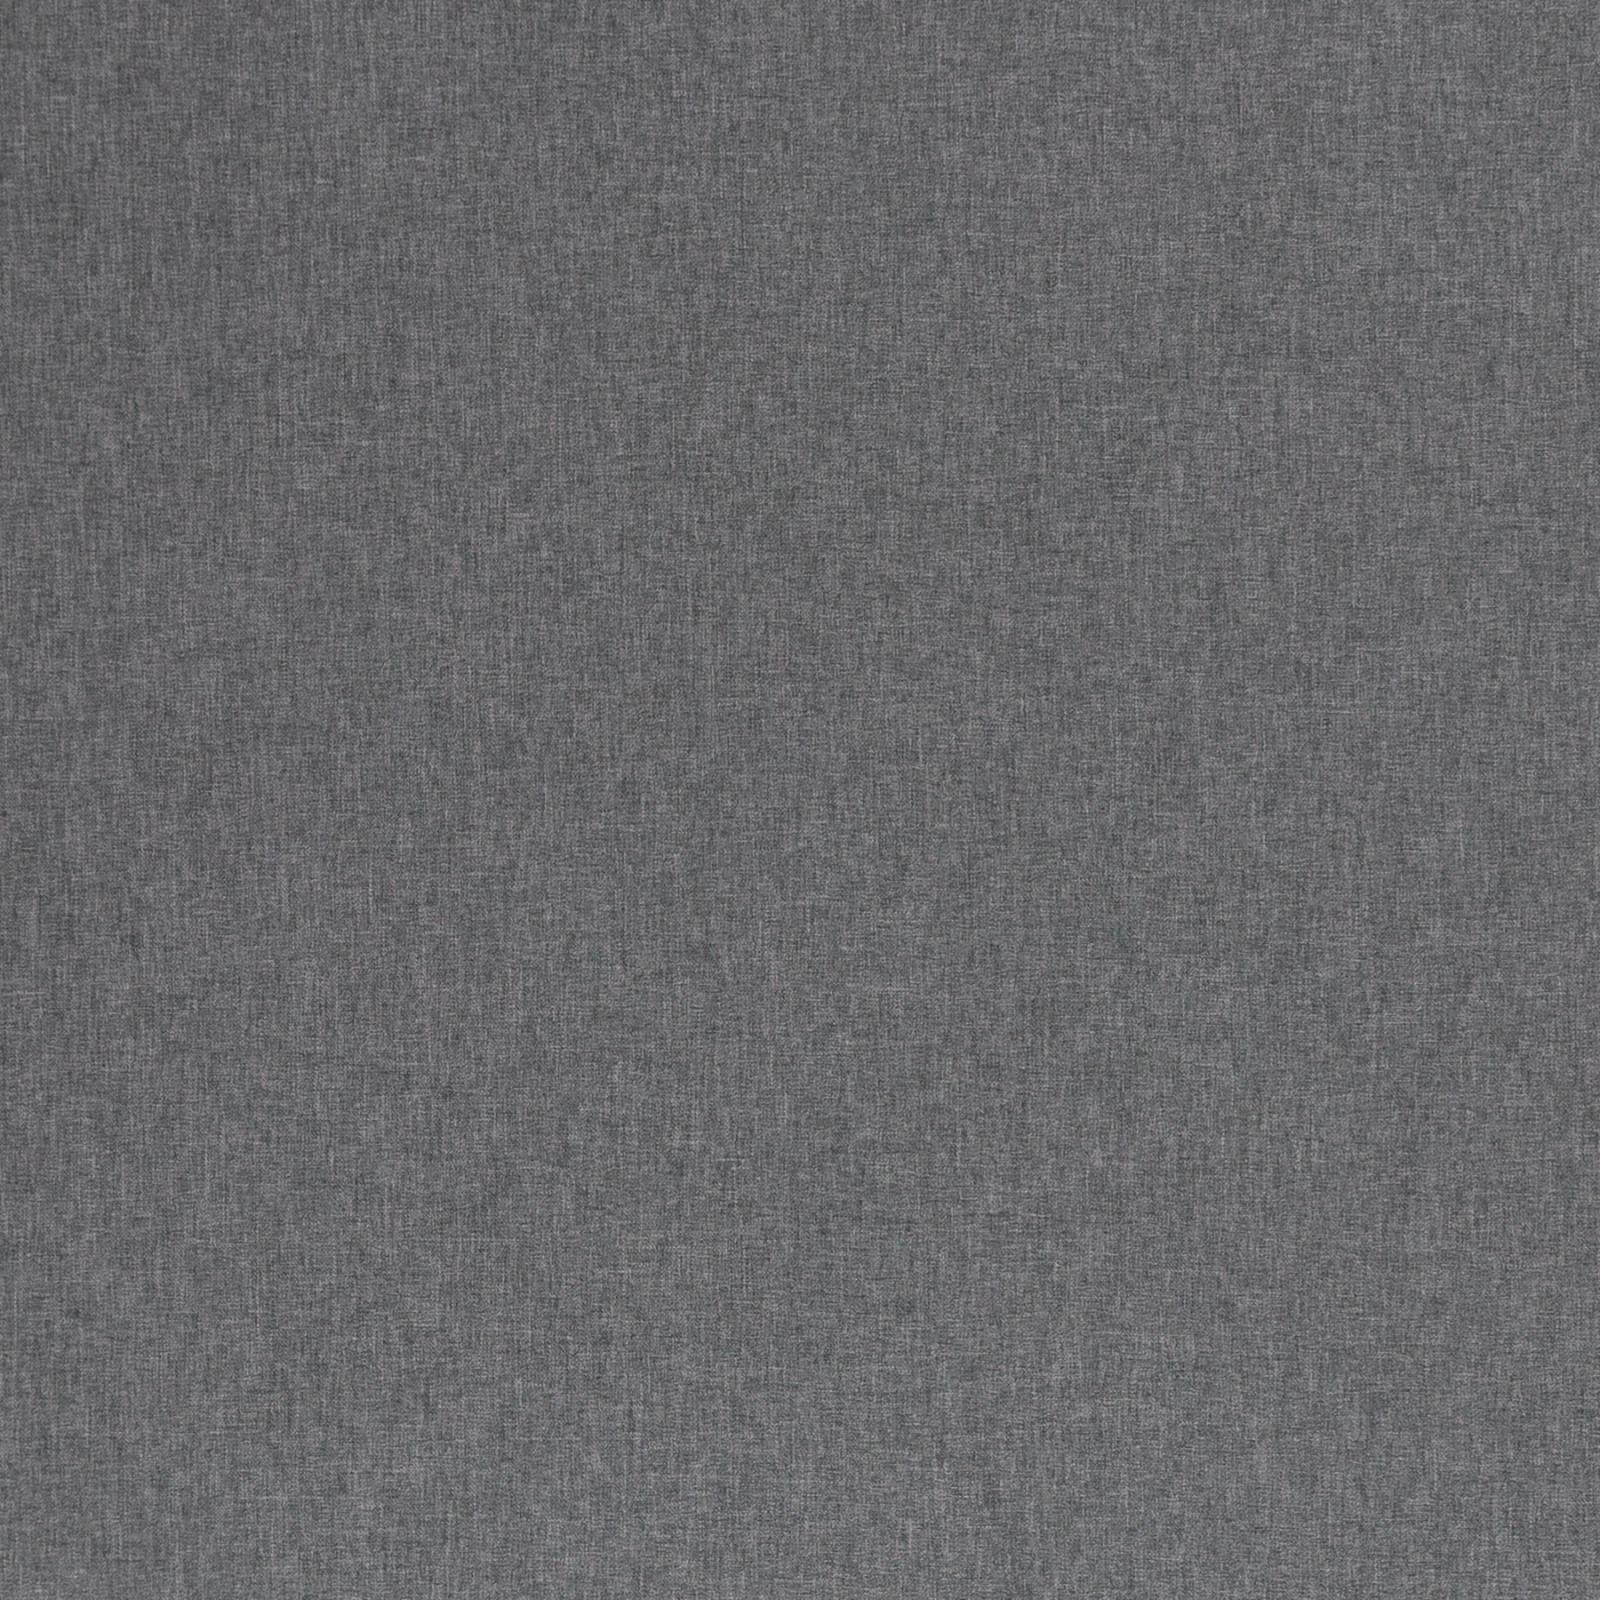 05m Skyler Nano Softshell meliert grau